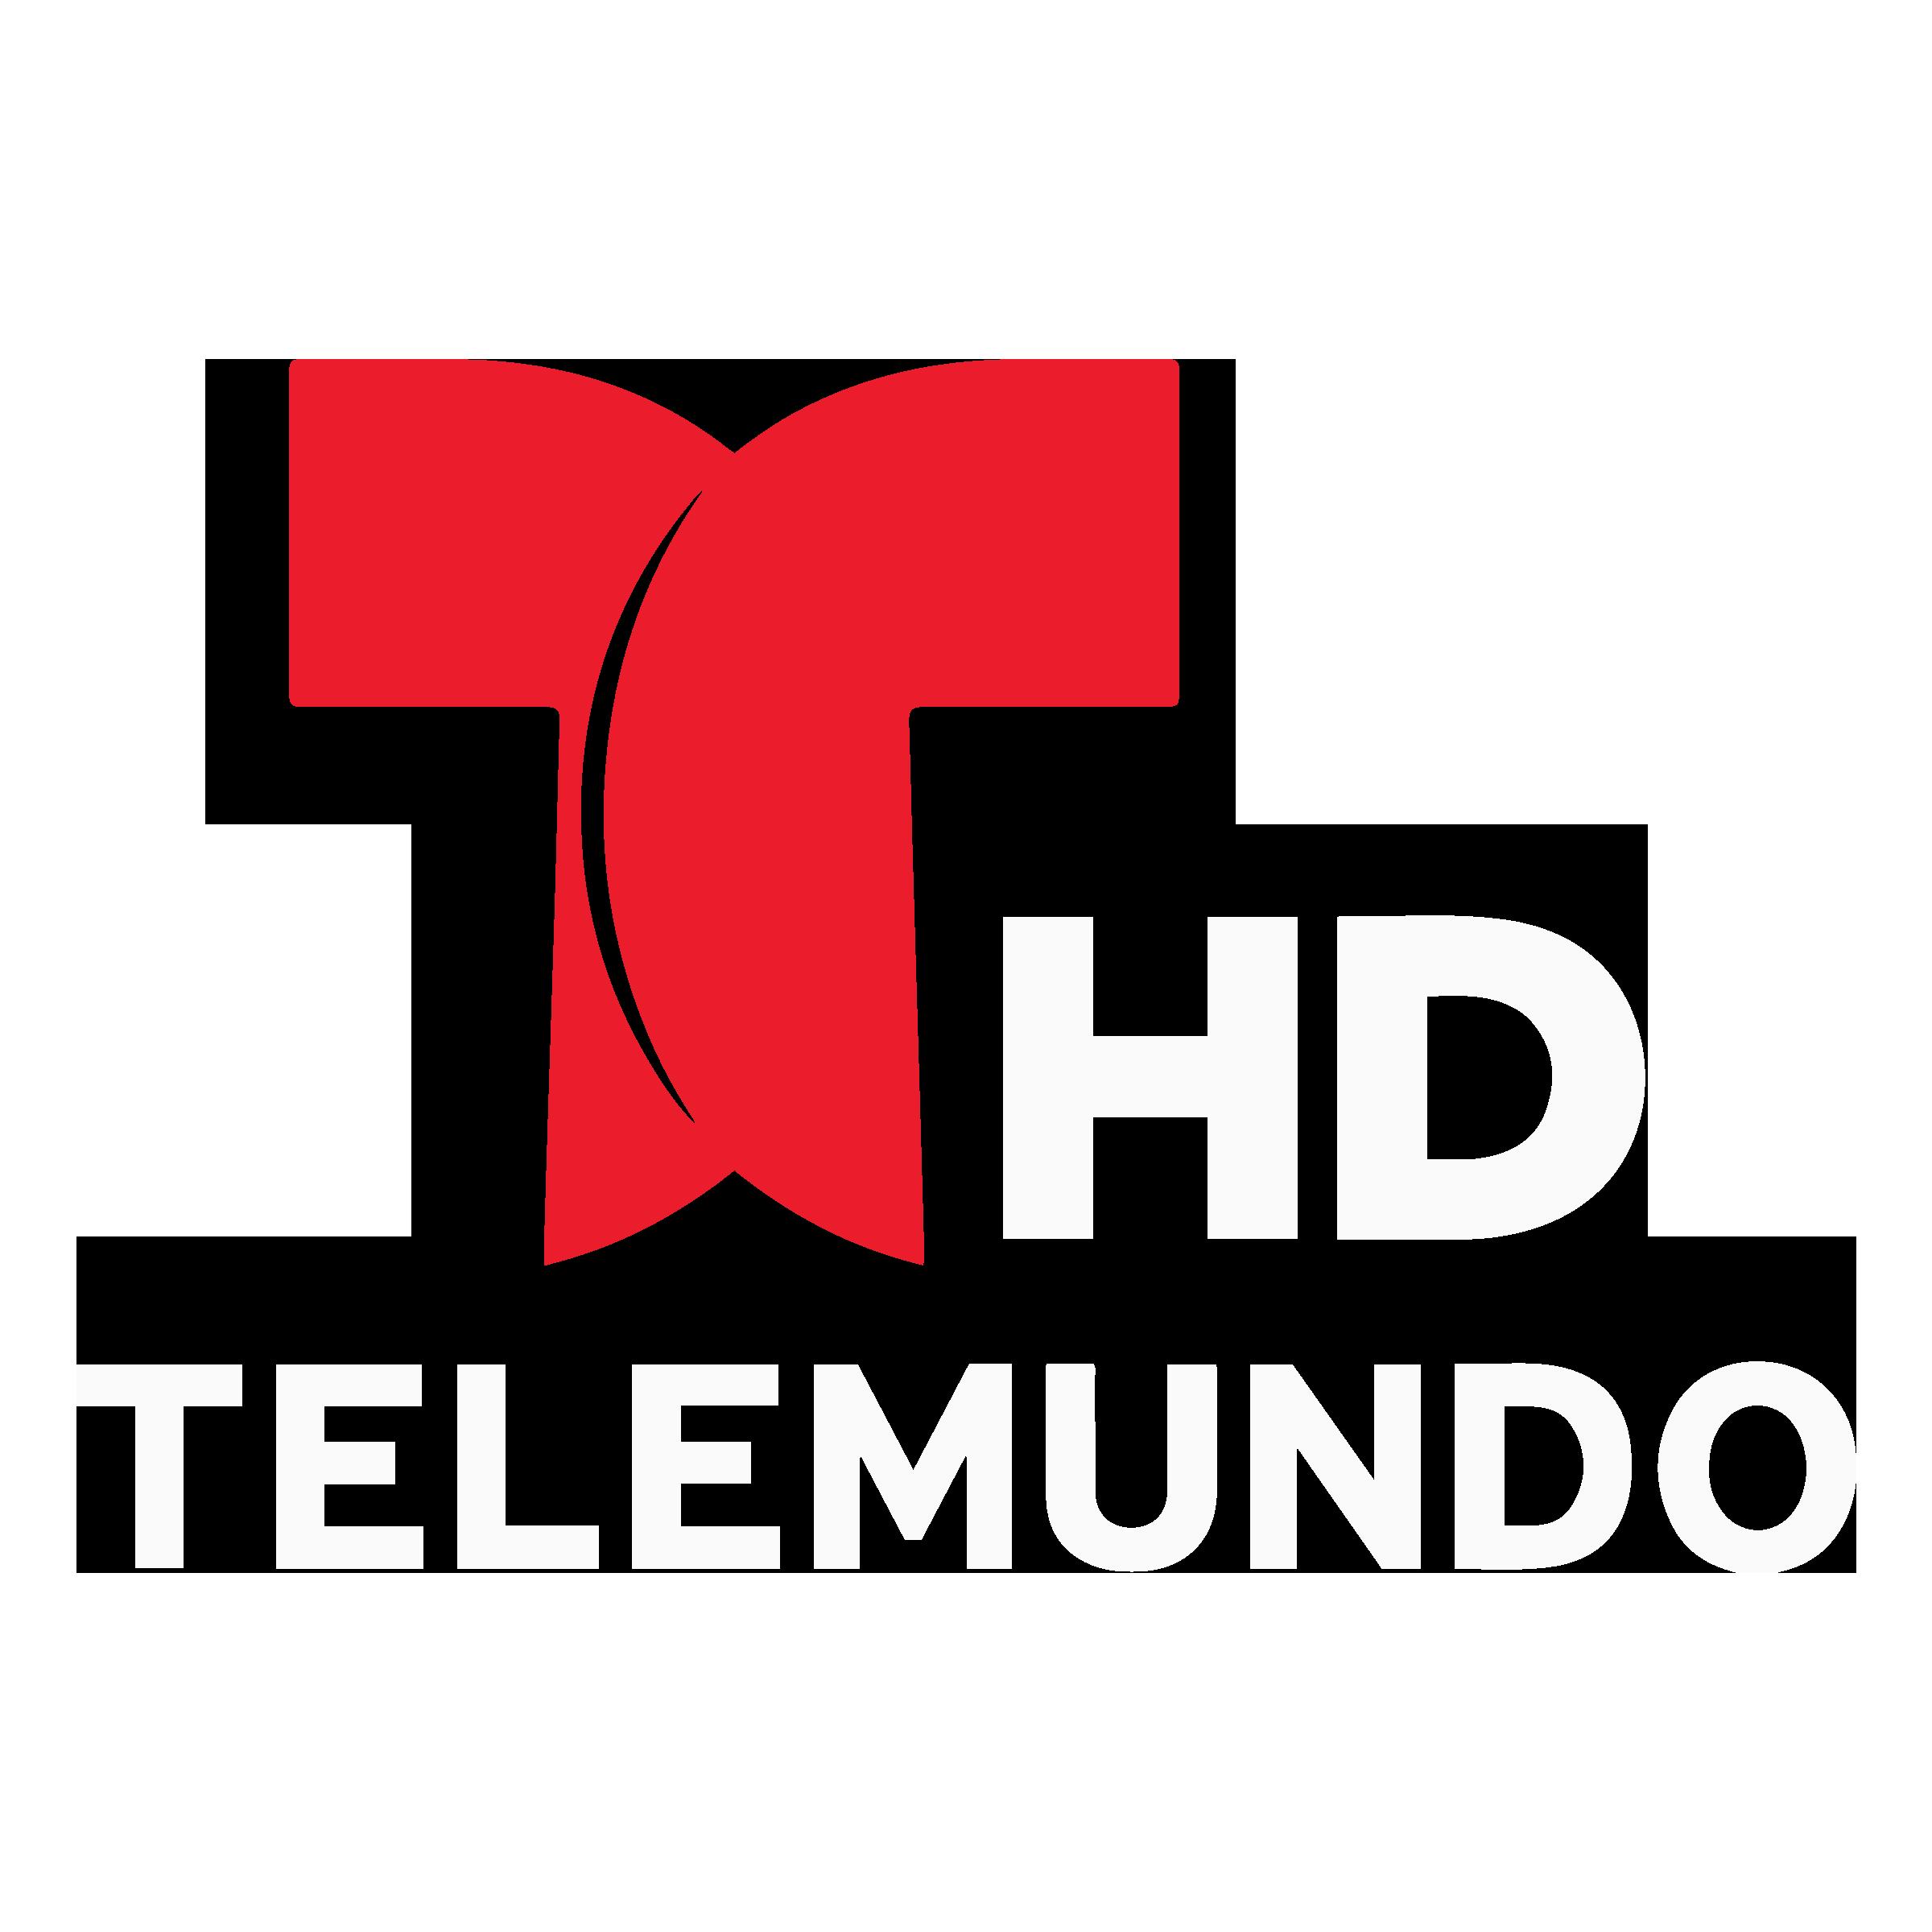 Telemundo Hd